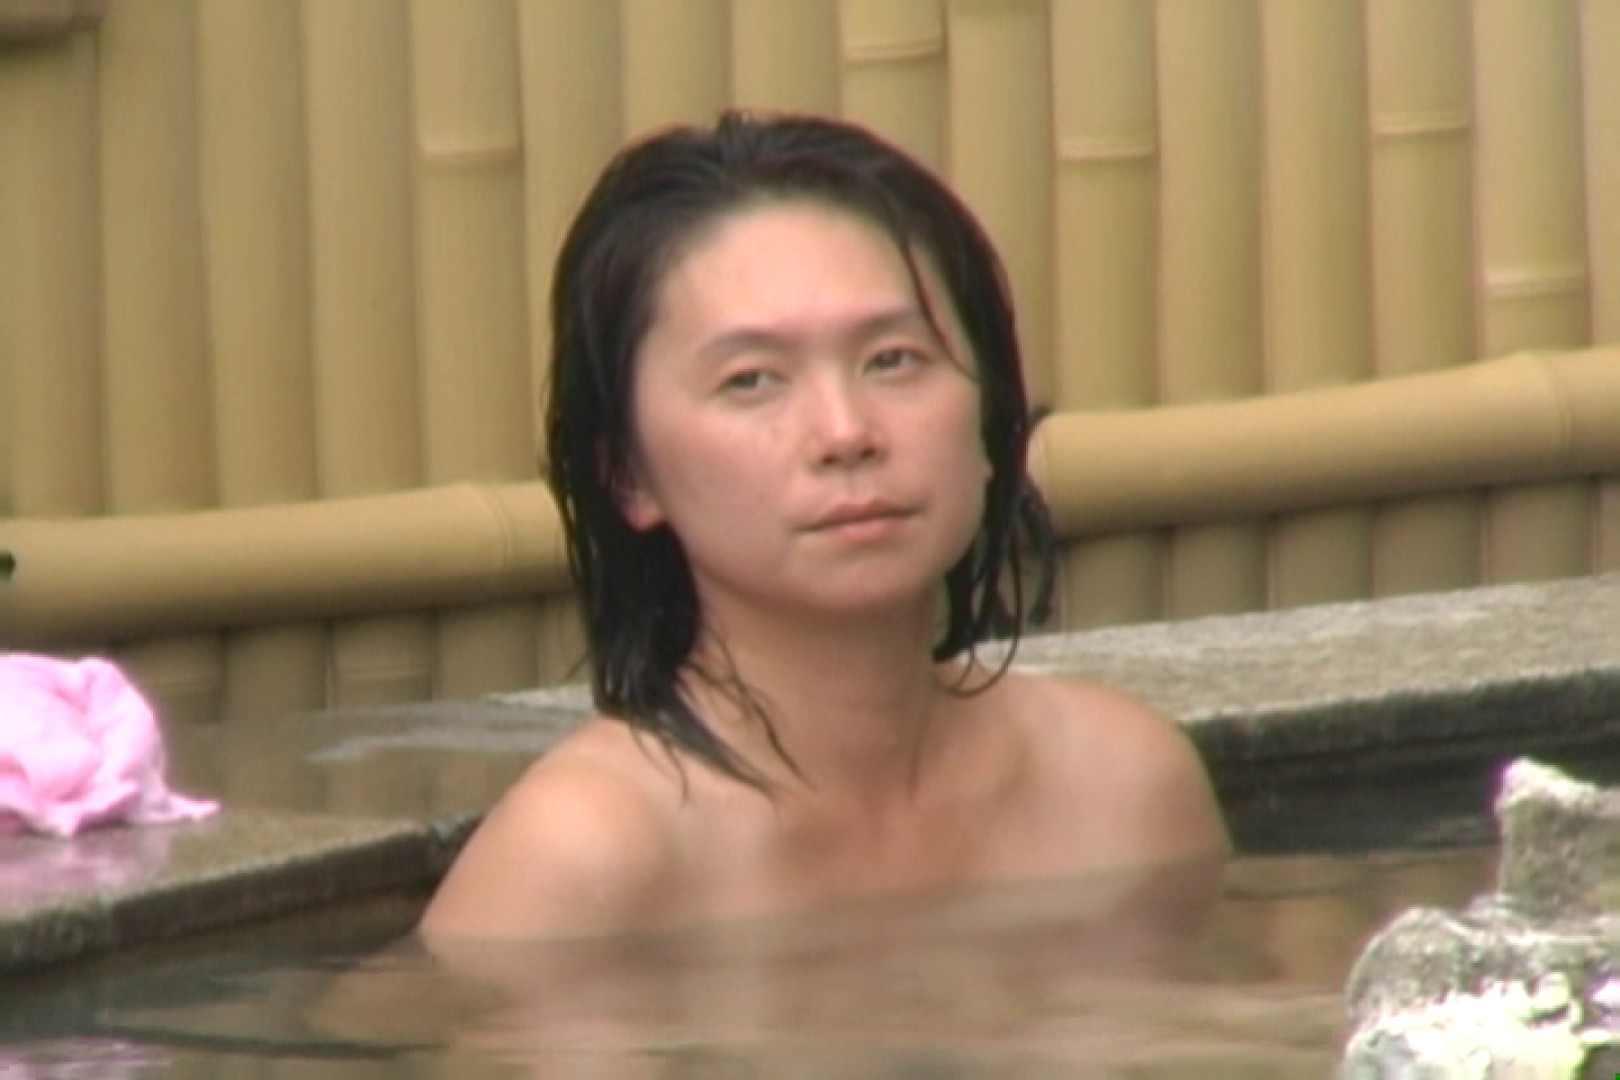 Aquaな露天風呂Vol.619 エッチな盗撮 ワレメ無修正動画無料 107pic 103